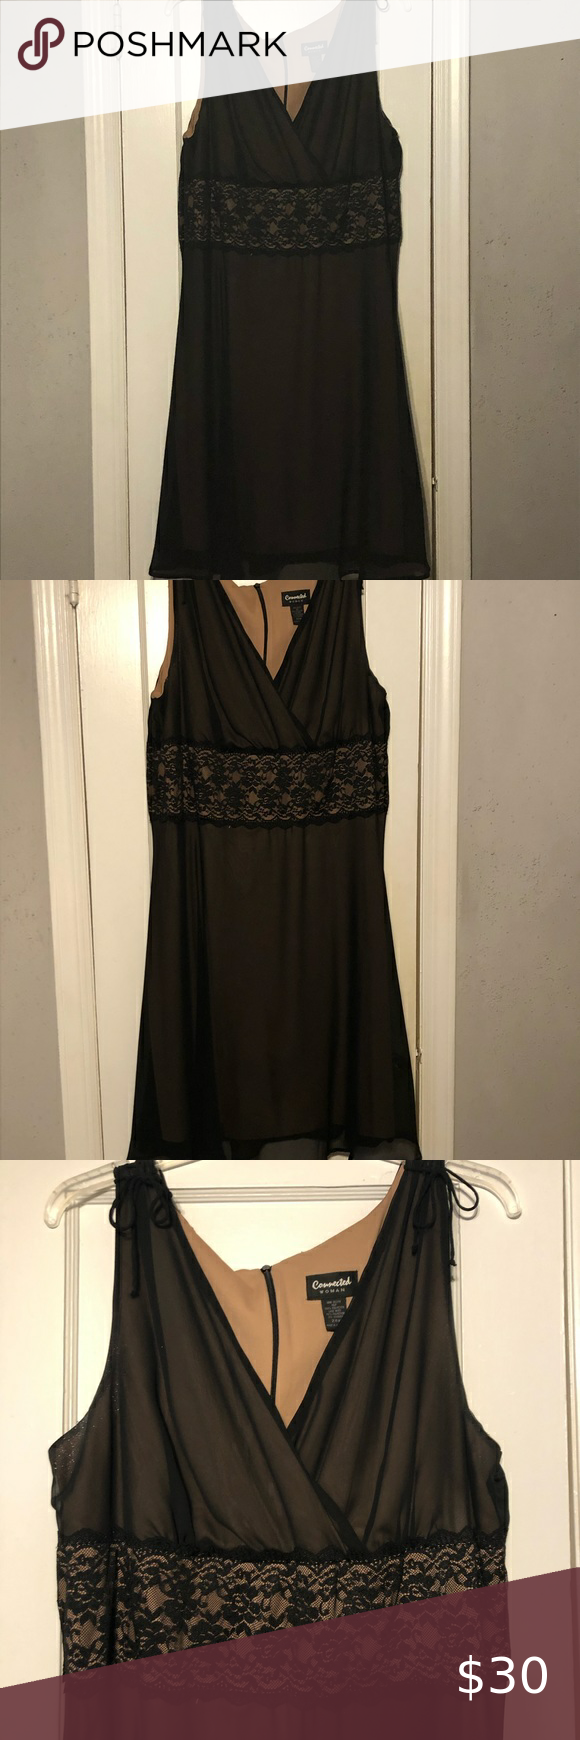 Women S Plus Size Black Dress With Sheer Overlay Plus Size Black Dresses Black Sheer Dress Classic Dress [ 1740 x 580 Pixel ]